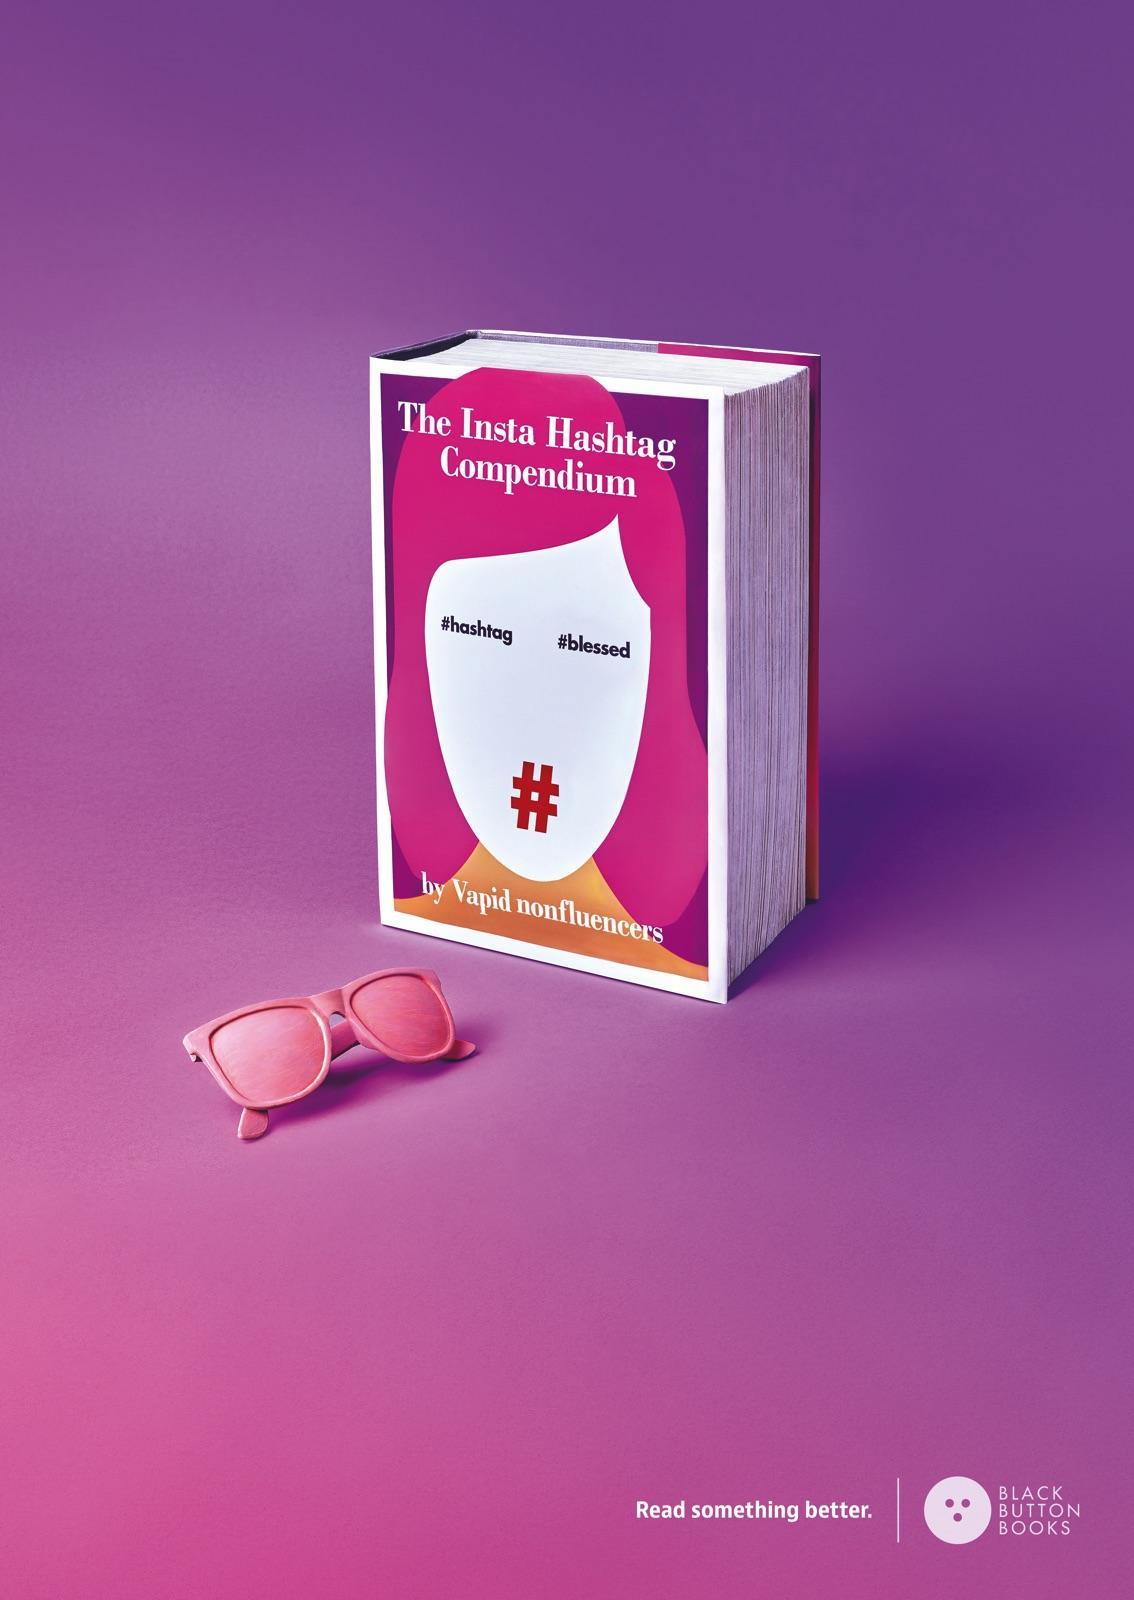 Black Button Books Print Ad - Hashtag Compendium